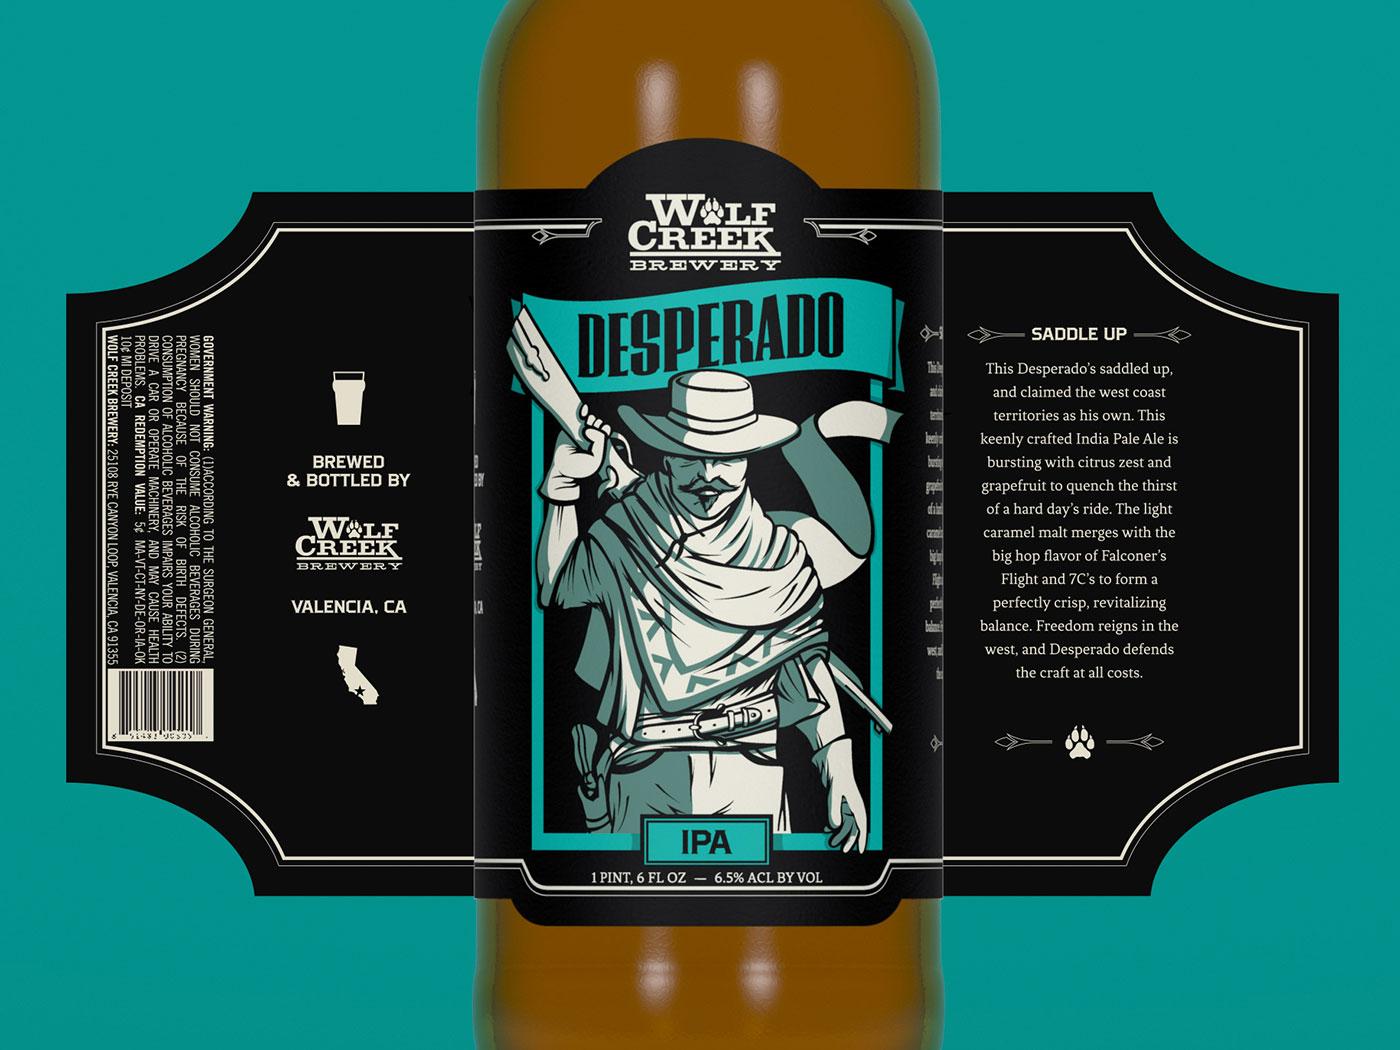 Wolf Creek Brewery - Desperado desperado bottle label craft beer ipa branding package design beer label illustration western cowboy